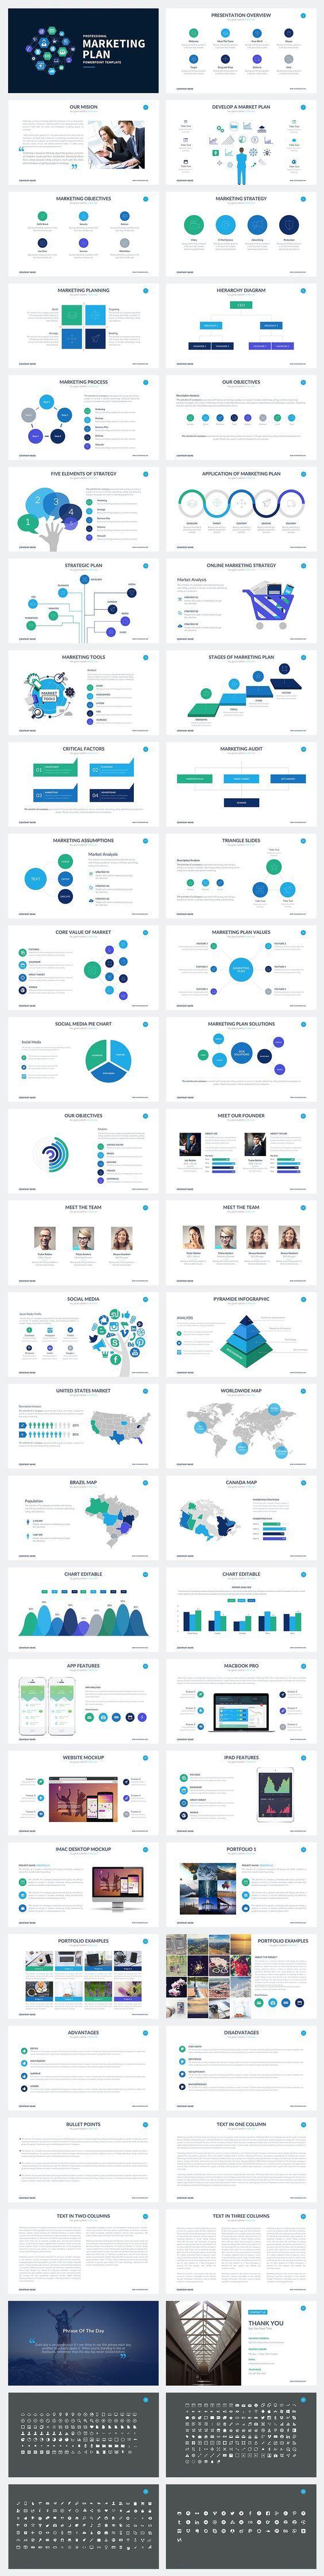 84 best free presentation templates images on pinterest free marketing plan powerpoint template toneelgroepblik Choice Image